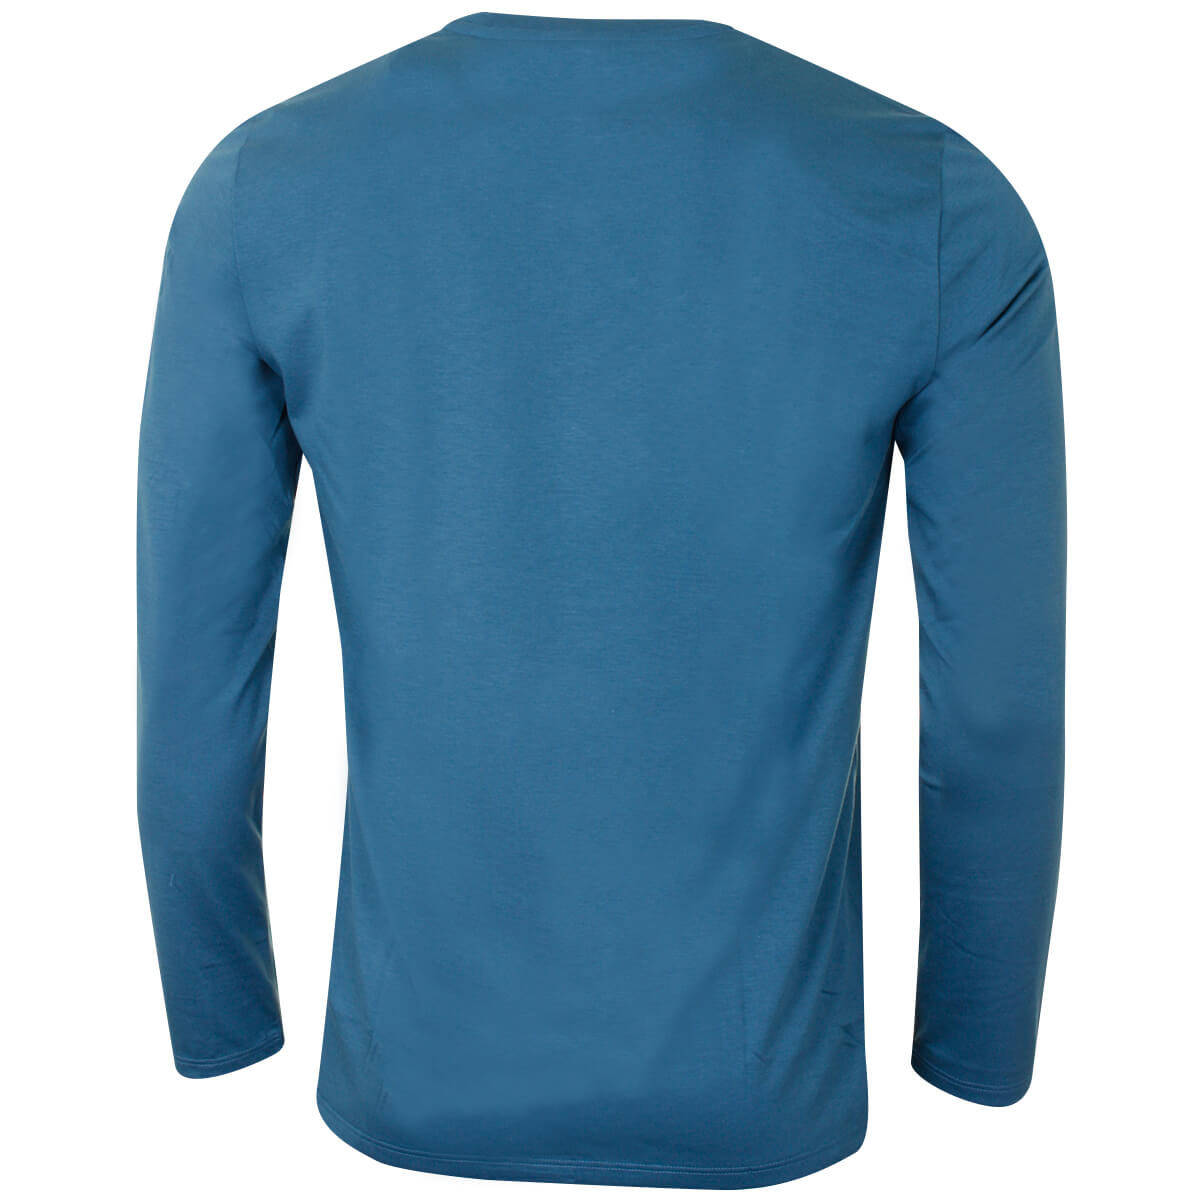 Lacoste-Mens-2019-LS-Crew-Neck-Cotton-T-Shirt-TH6712-Long-Sleeve-Tee thumbnail 9